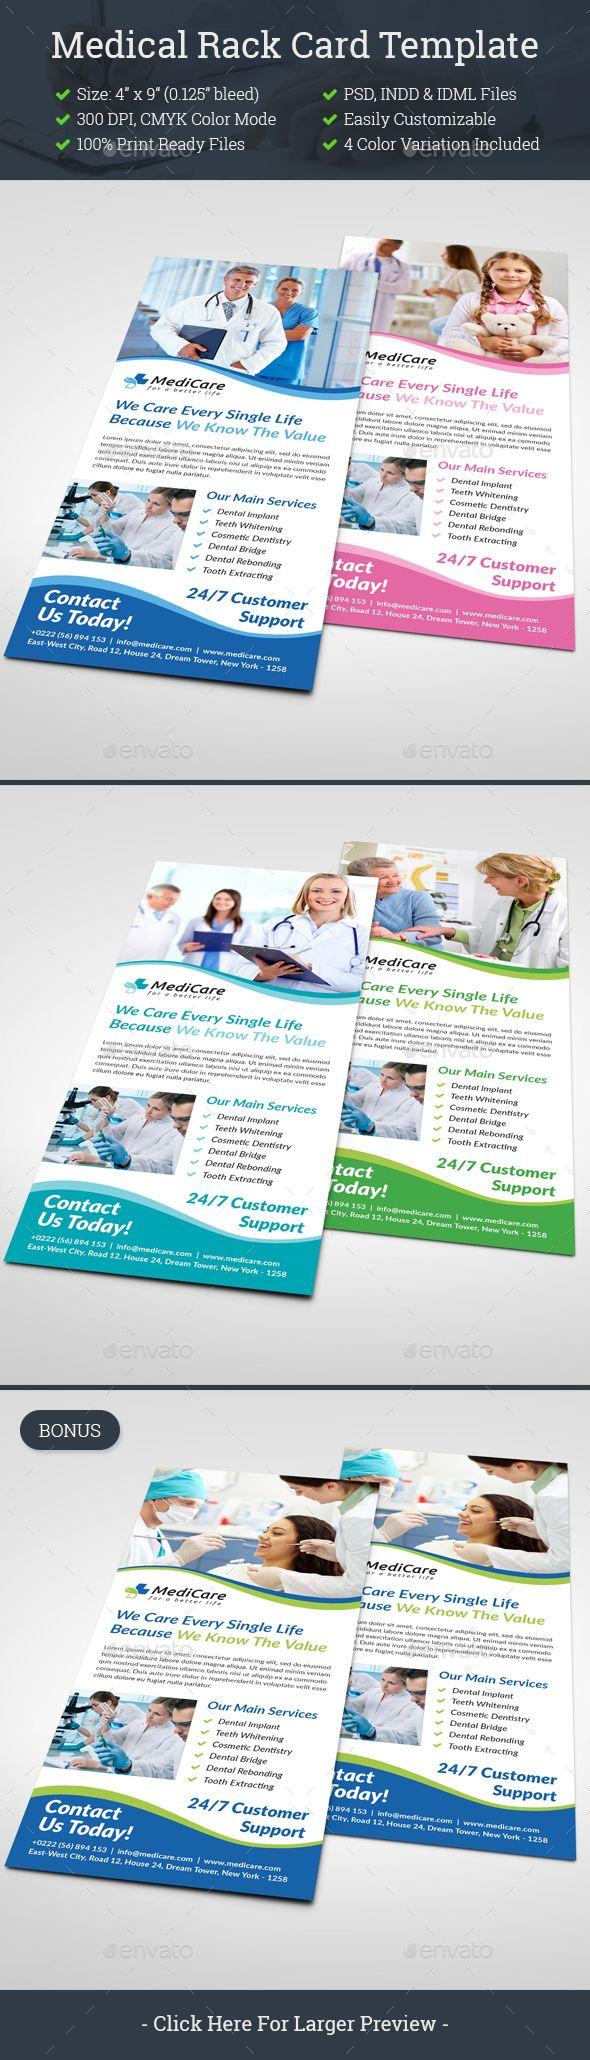 Medical Rack Card Template Psd Indesign Indd Rack Card Templates Healthcare Advertising Rack Card